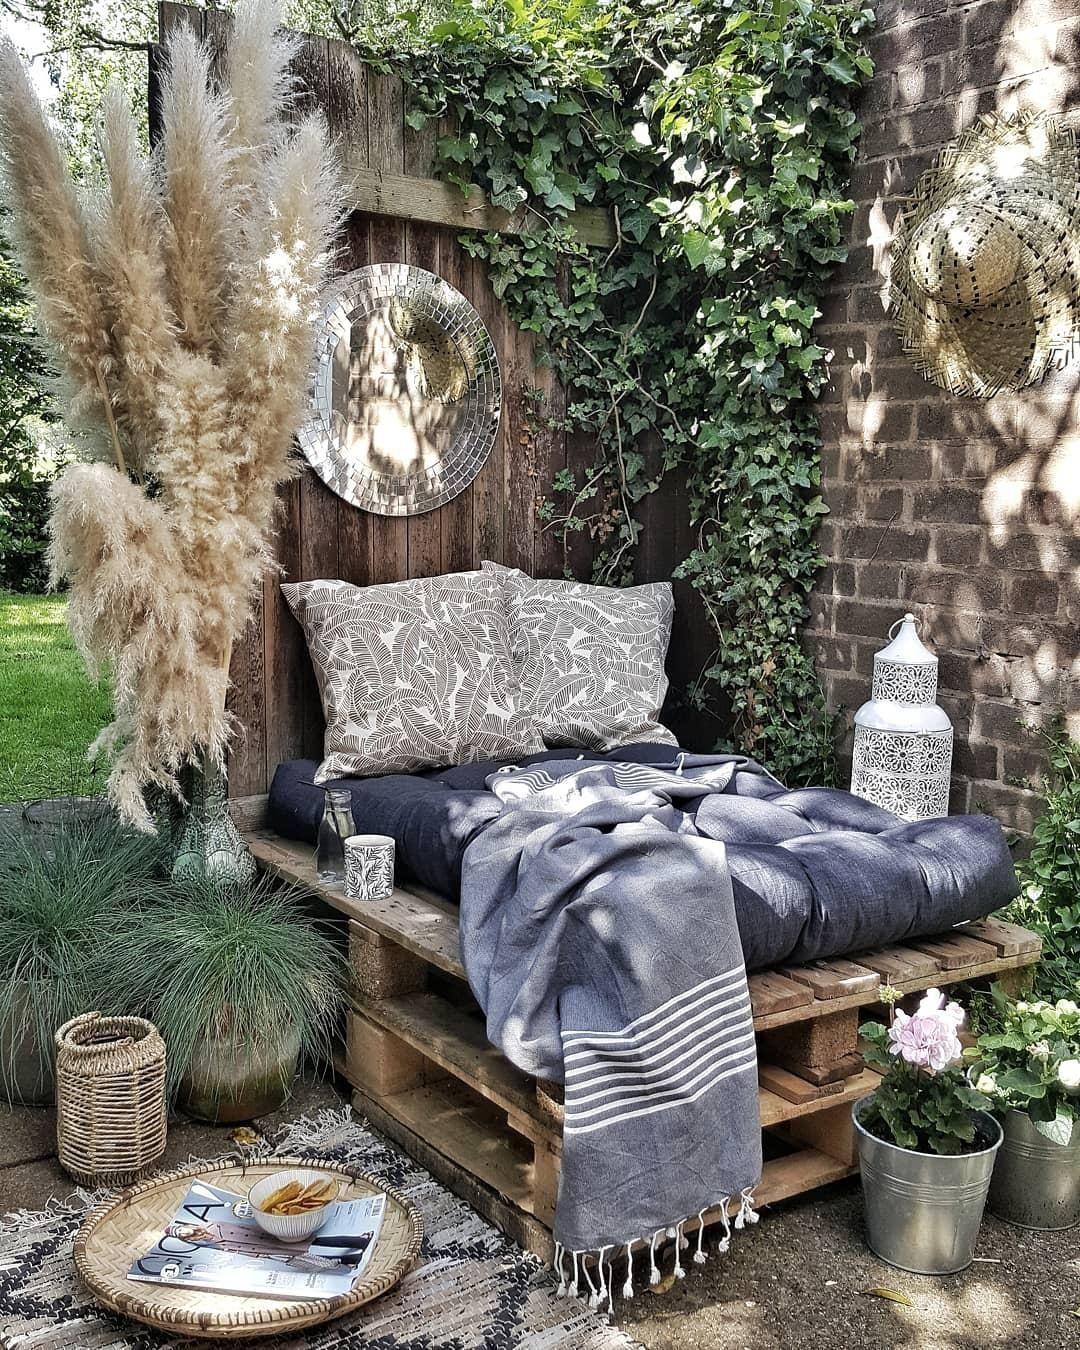 Garten Interior Sommer Couchliebt Hygge In 2020 Home Outdoor Living Home Decor